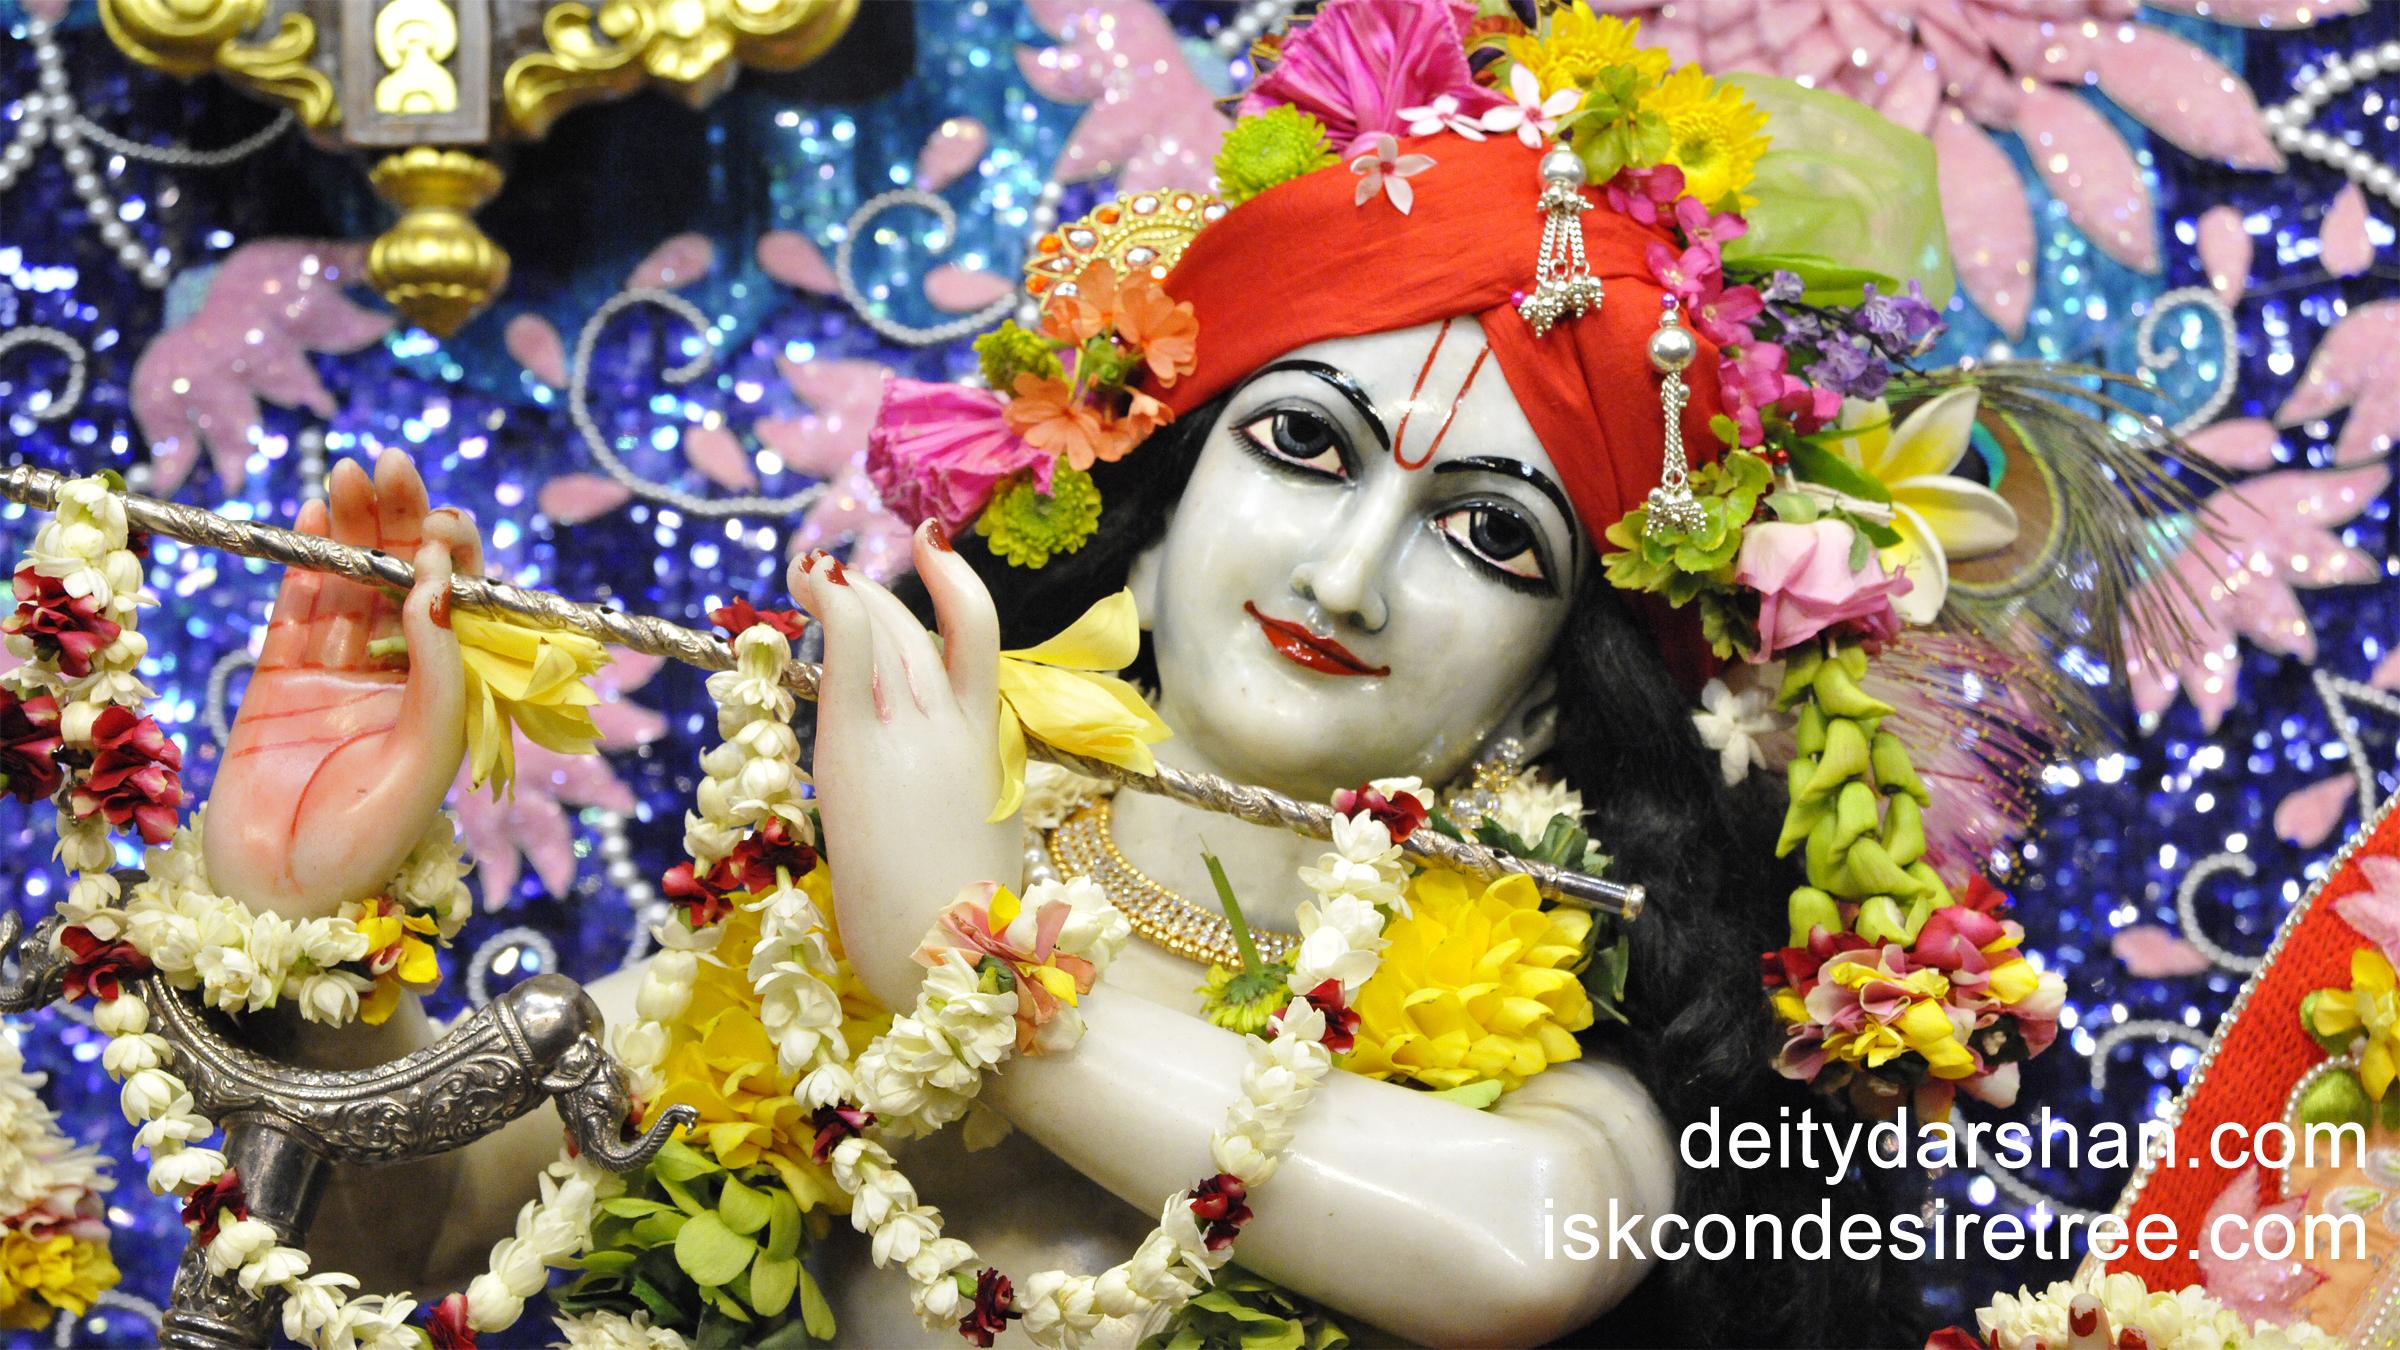 Sri Gopinath Close up Wallpaper (057) Size 2400x1350 Download